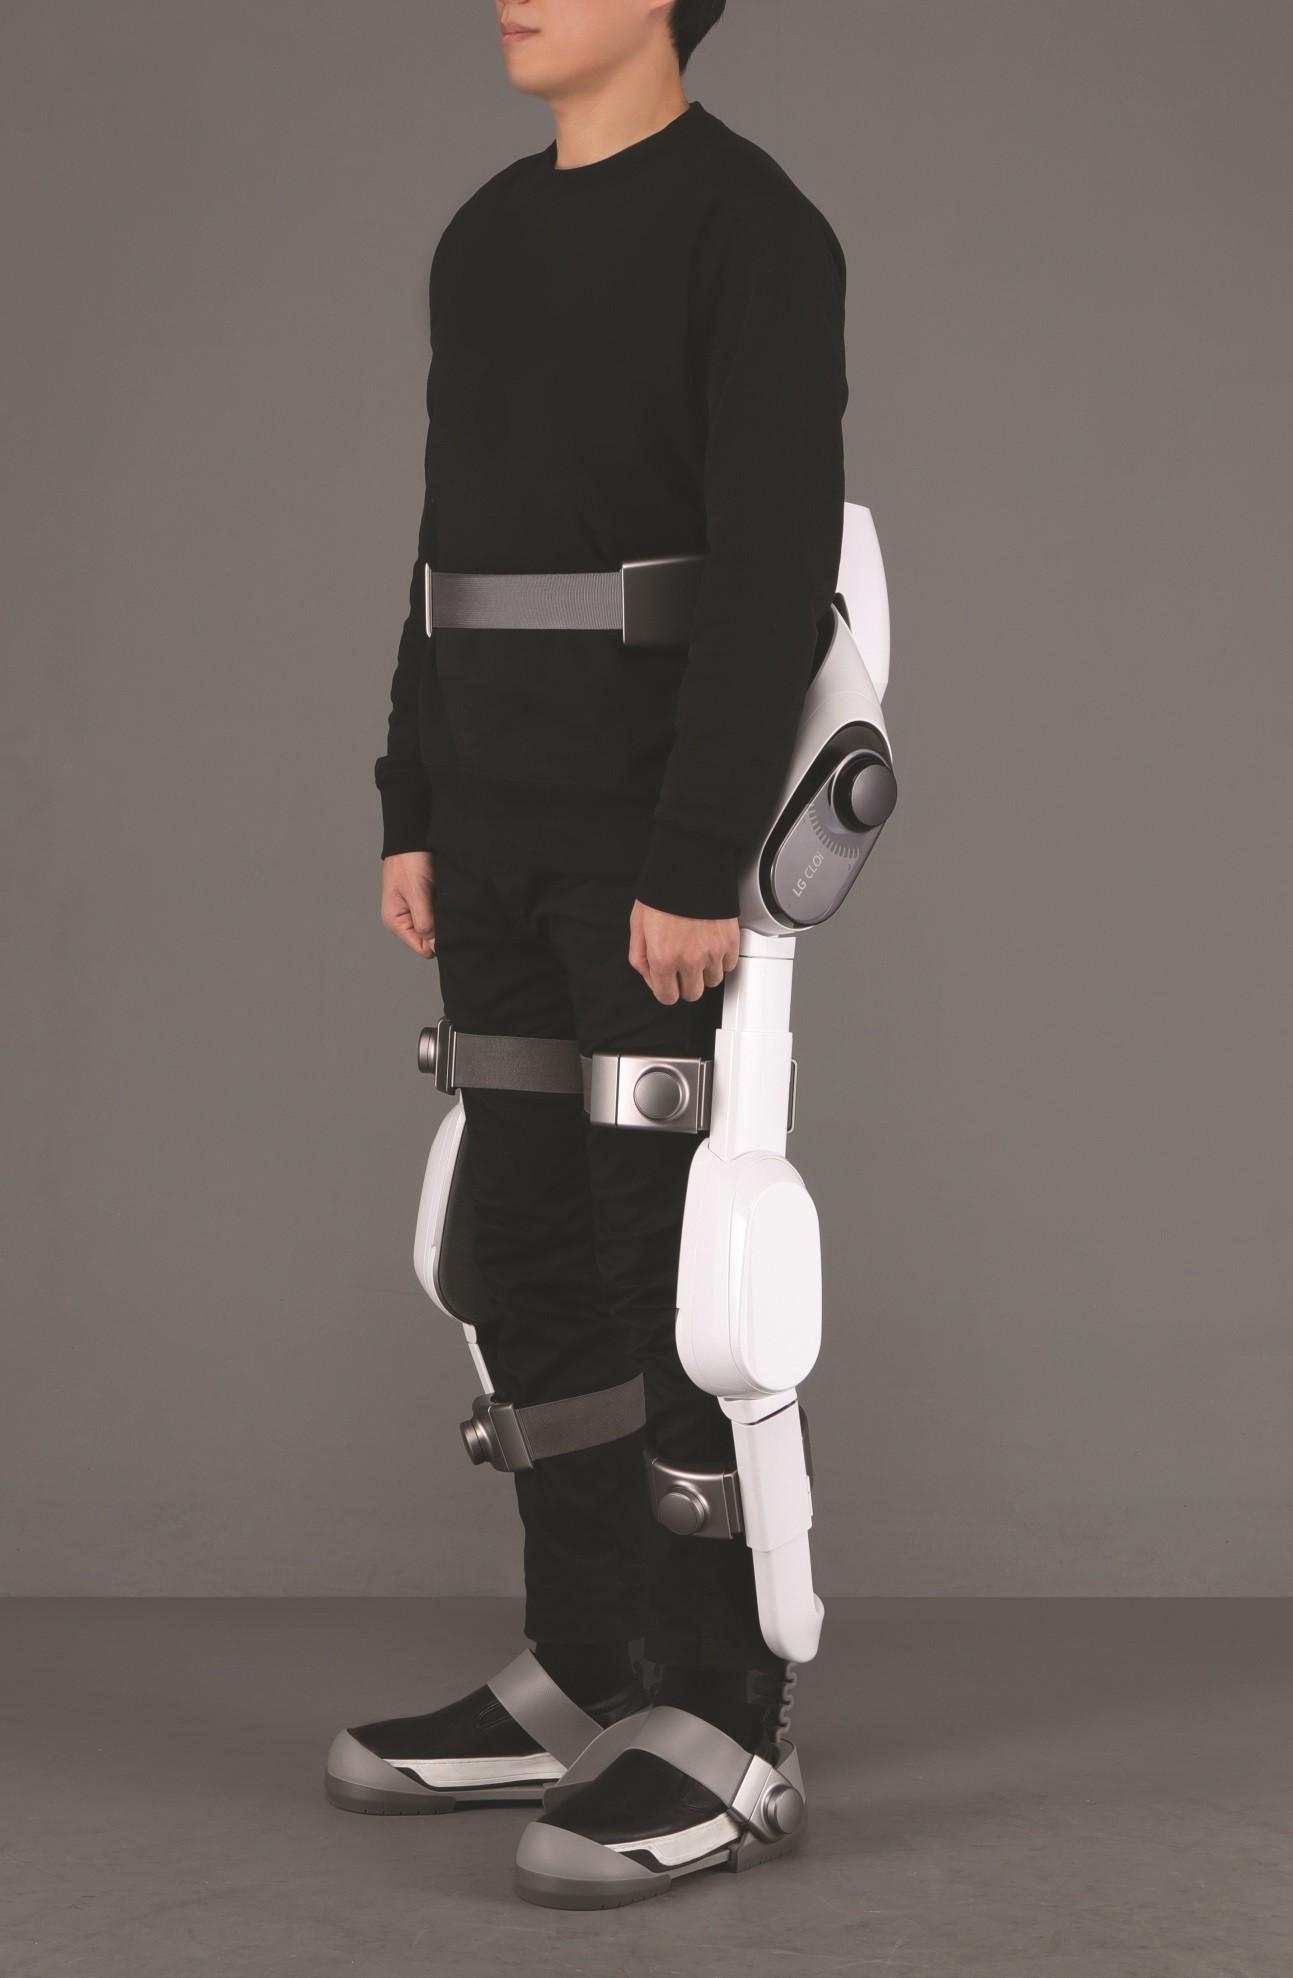 Hyundai_exoskeletons_0003